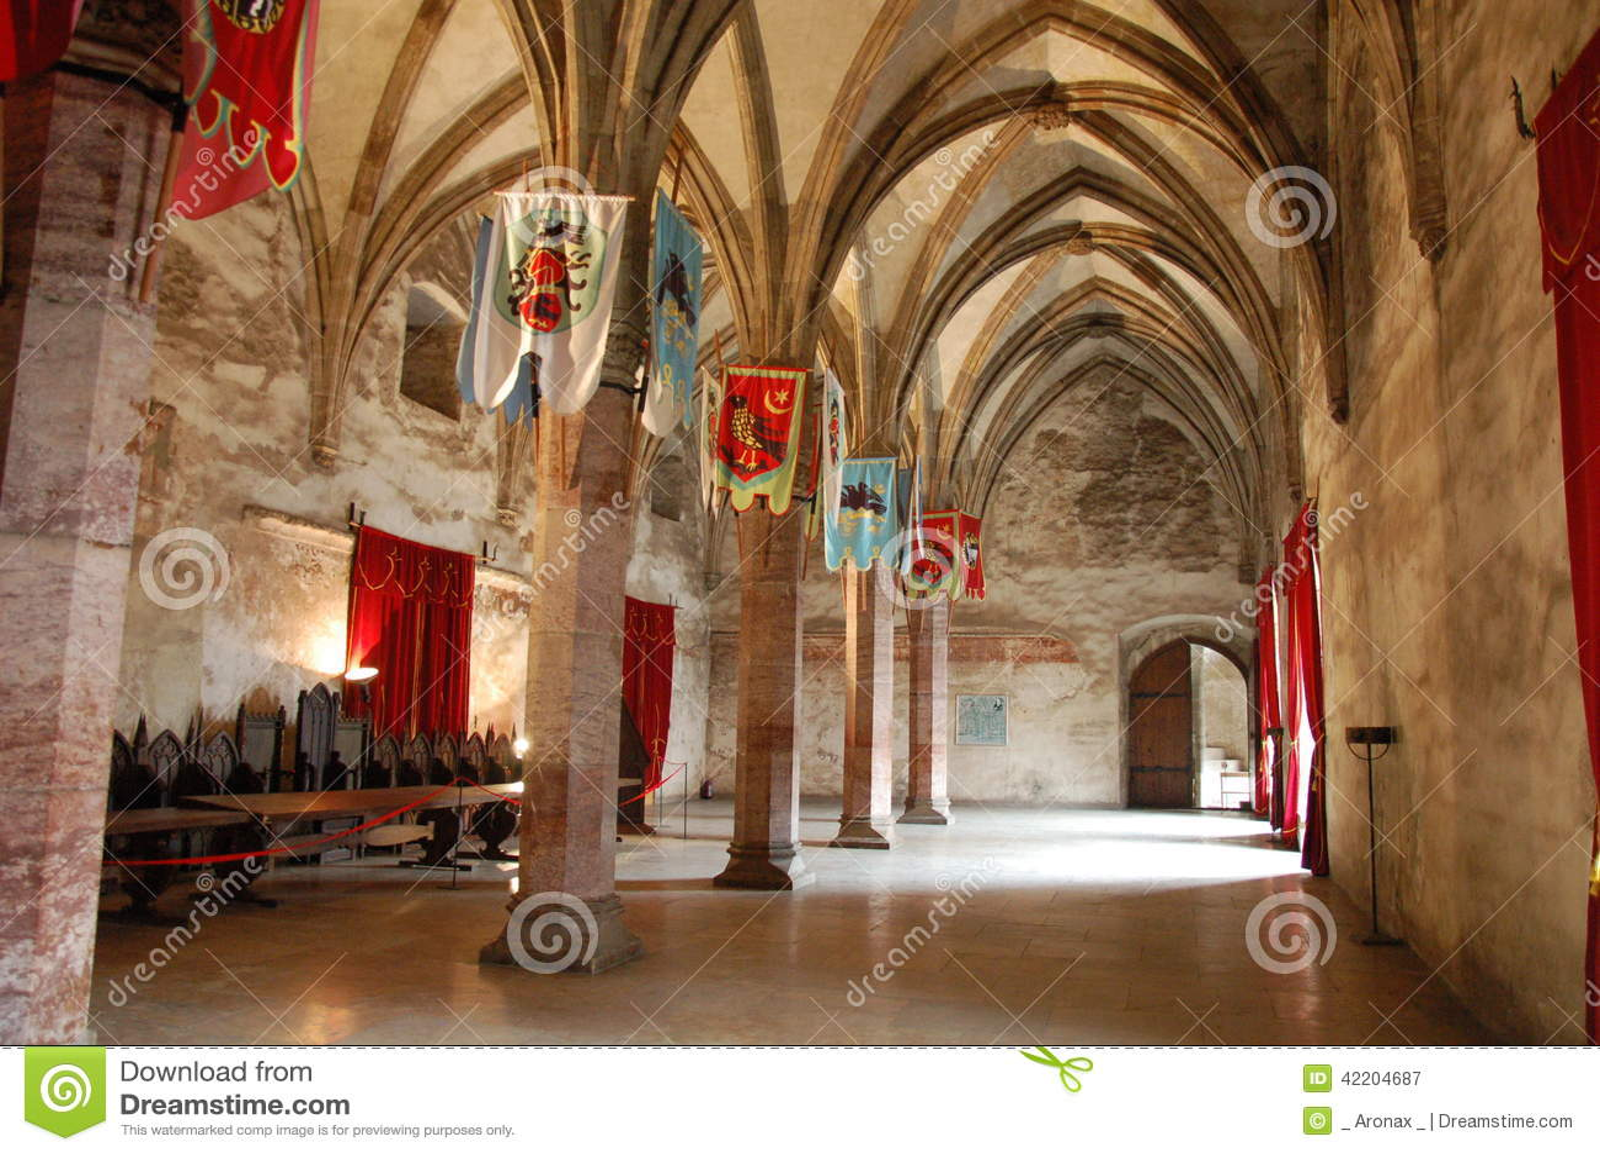 Gran Pasillo medieval, castillo de Huniards